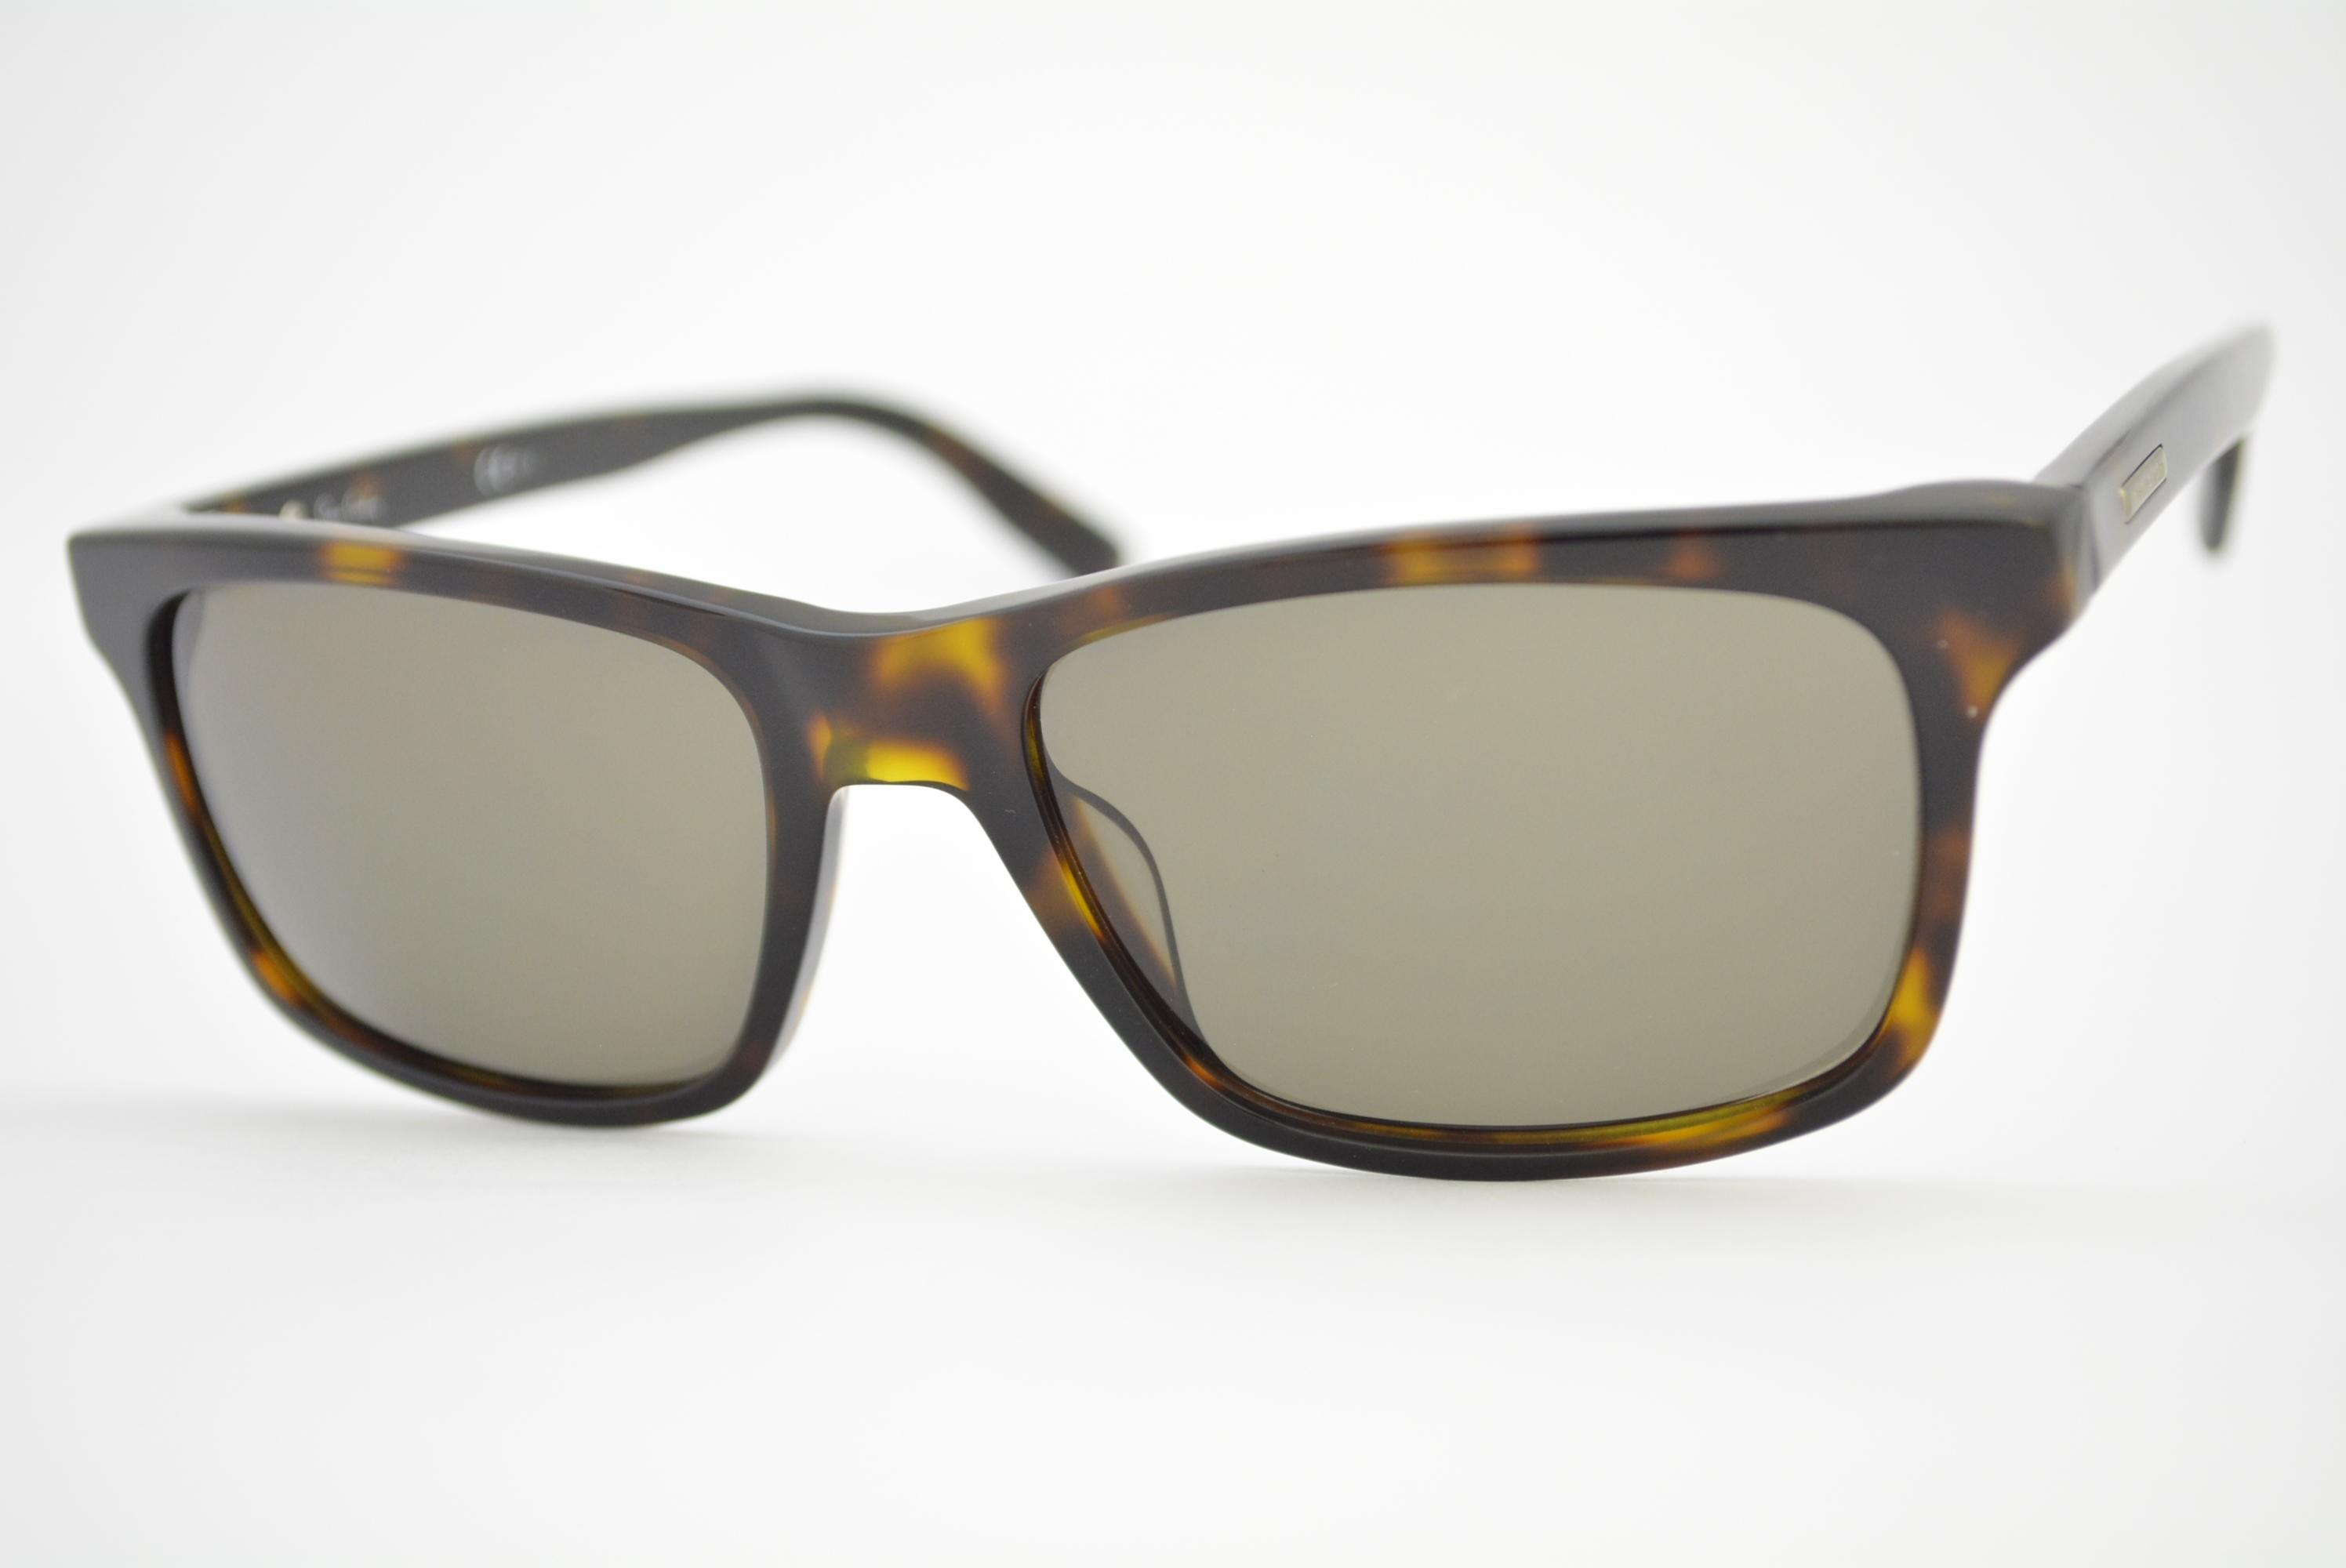 02deccbe4 óculos de sol Pierre Cardin mod pc6189/s lhdx1 Ótica Cardoso